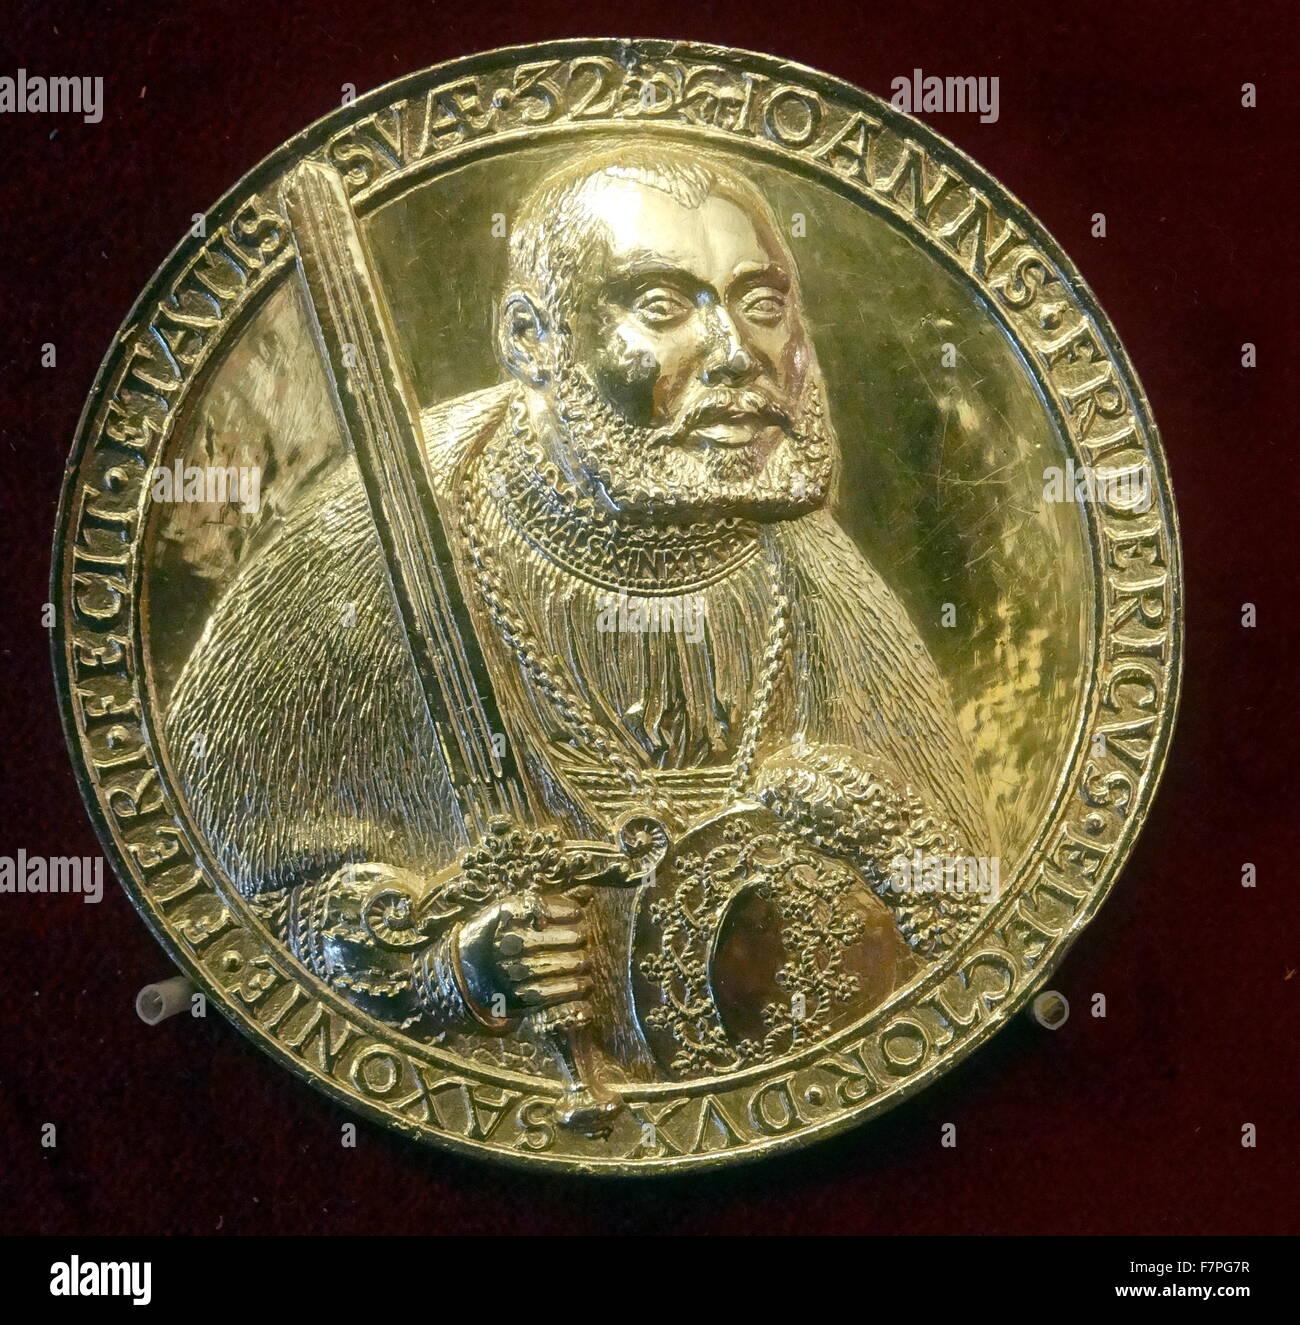 John Huss, made from gilt bronze. - Stock Image